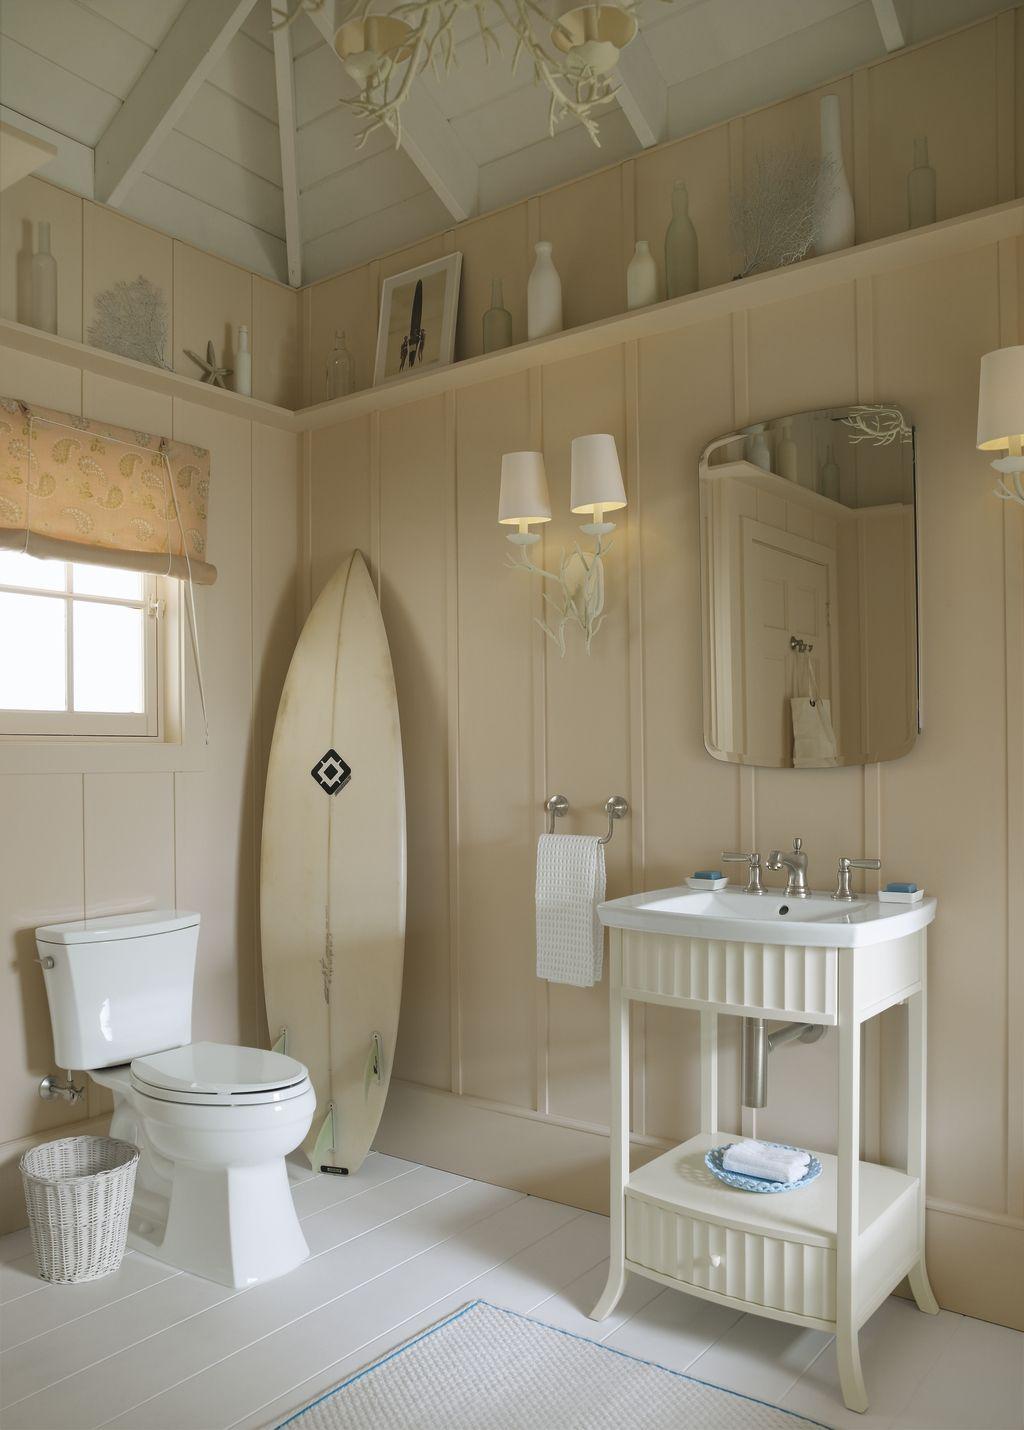 Beach Bathroom Love The Surf Board, Surf Bathroom Ideas